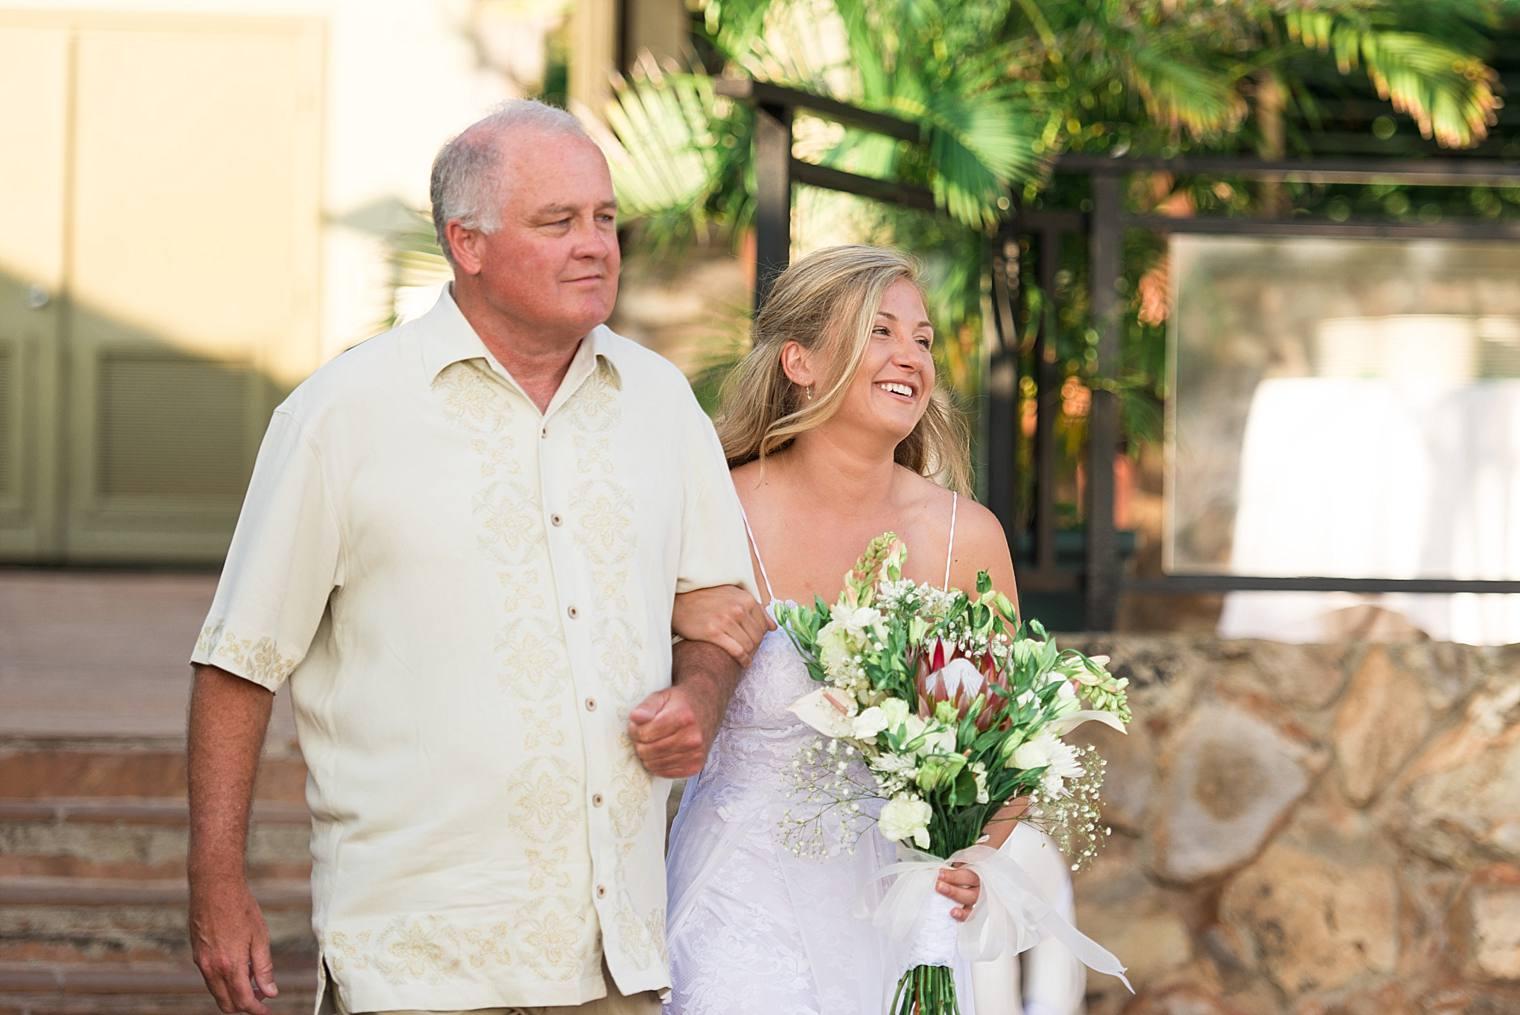 Destination Wedding at Sea House Napili - Maui Wedding Photographer_0017